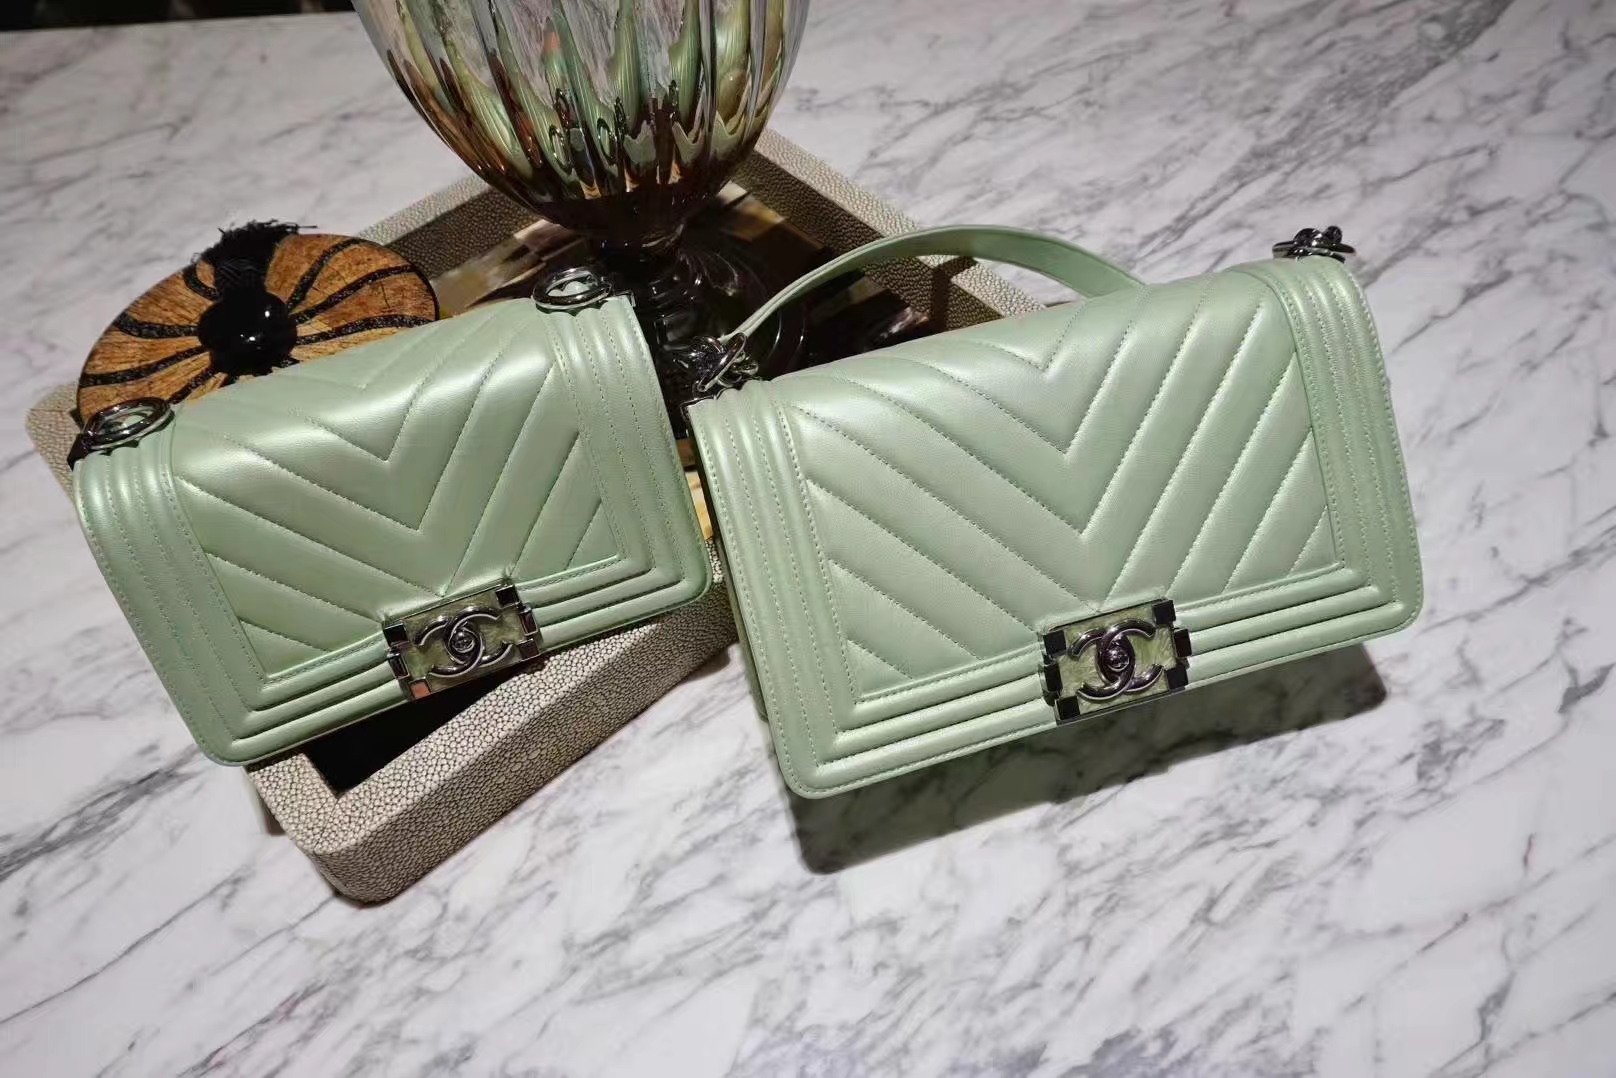 Chanel 香奈儿 Leboy系列 25cm 原厂小羊皮 珠光绿色 大理石纹琉璃五金